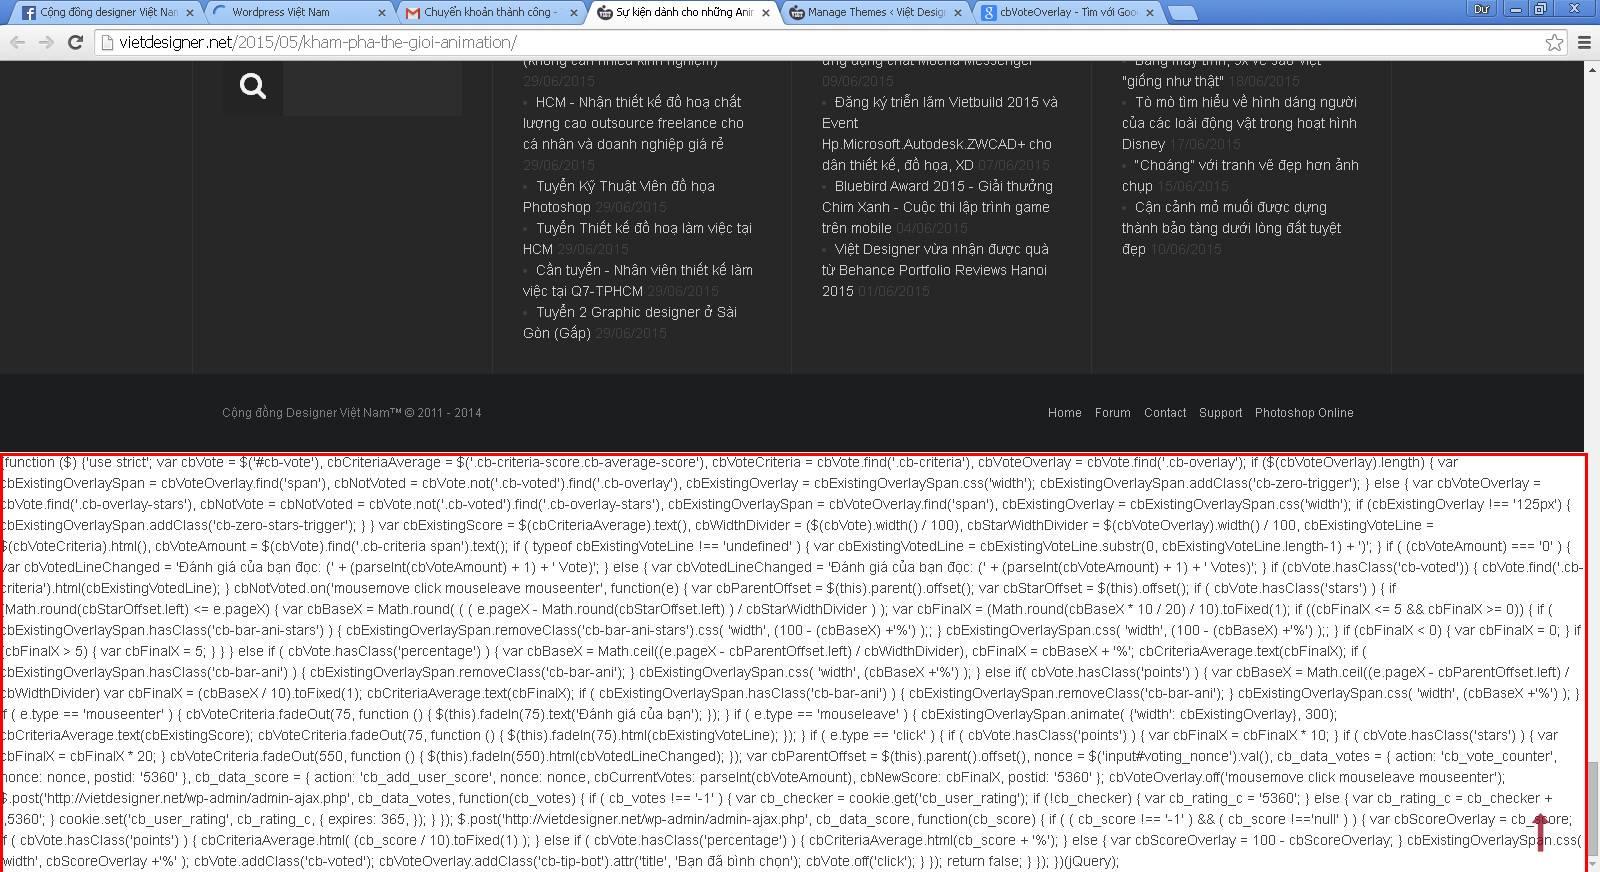 hoi-tai-sao-cuoi-footer-no-hien-ra-dong-loi-trong-wordpress